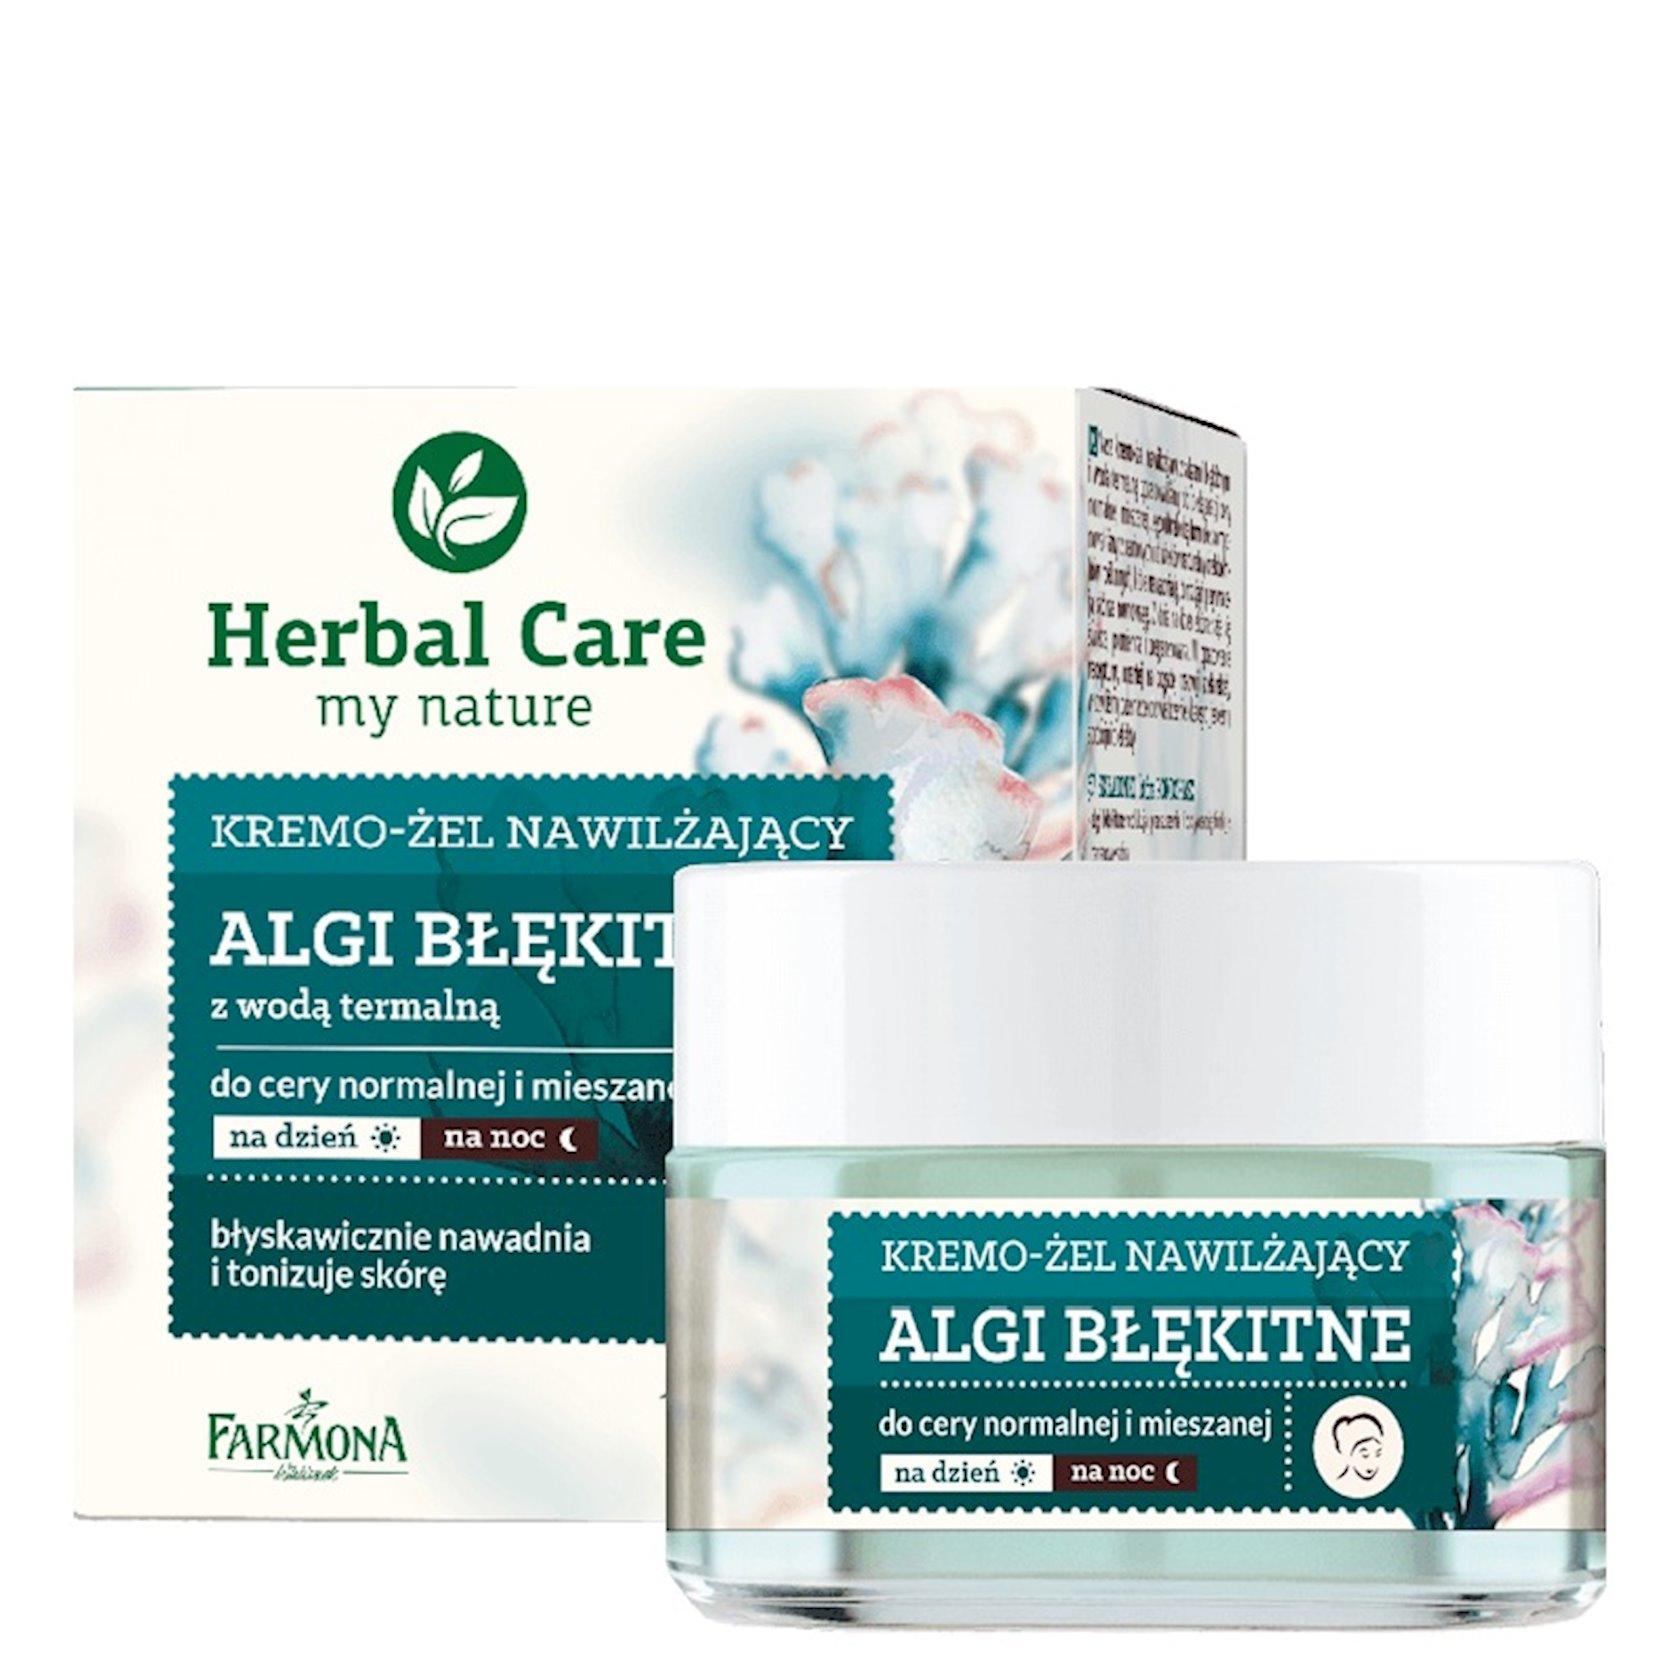 Nəmləndirici üz kremi Farmona Herbal Care Blue Algae Cream